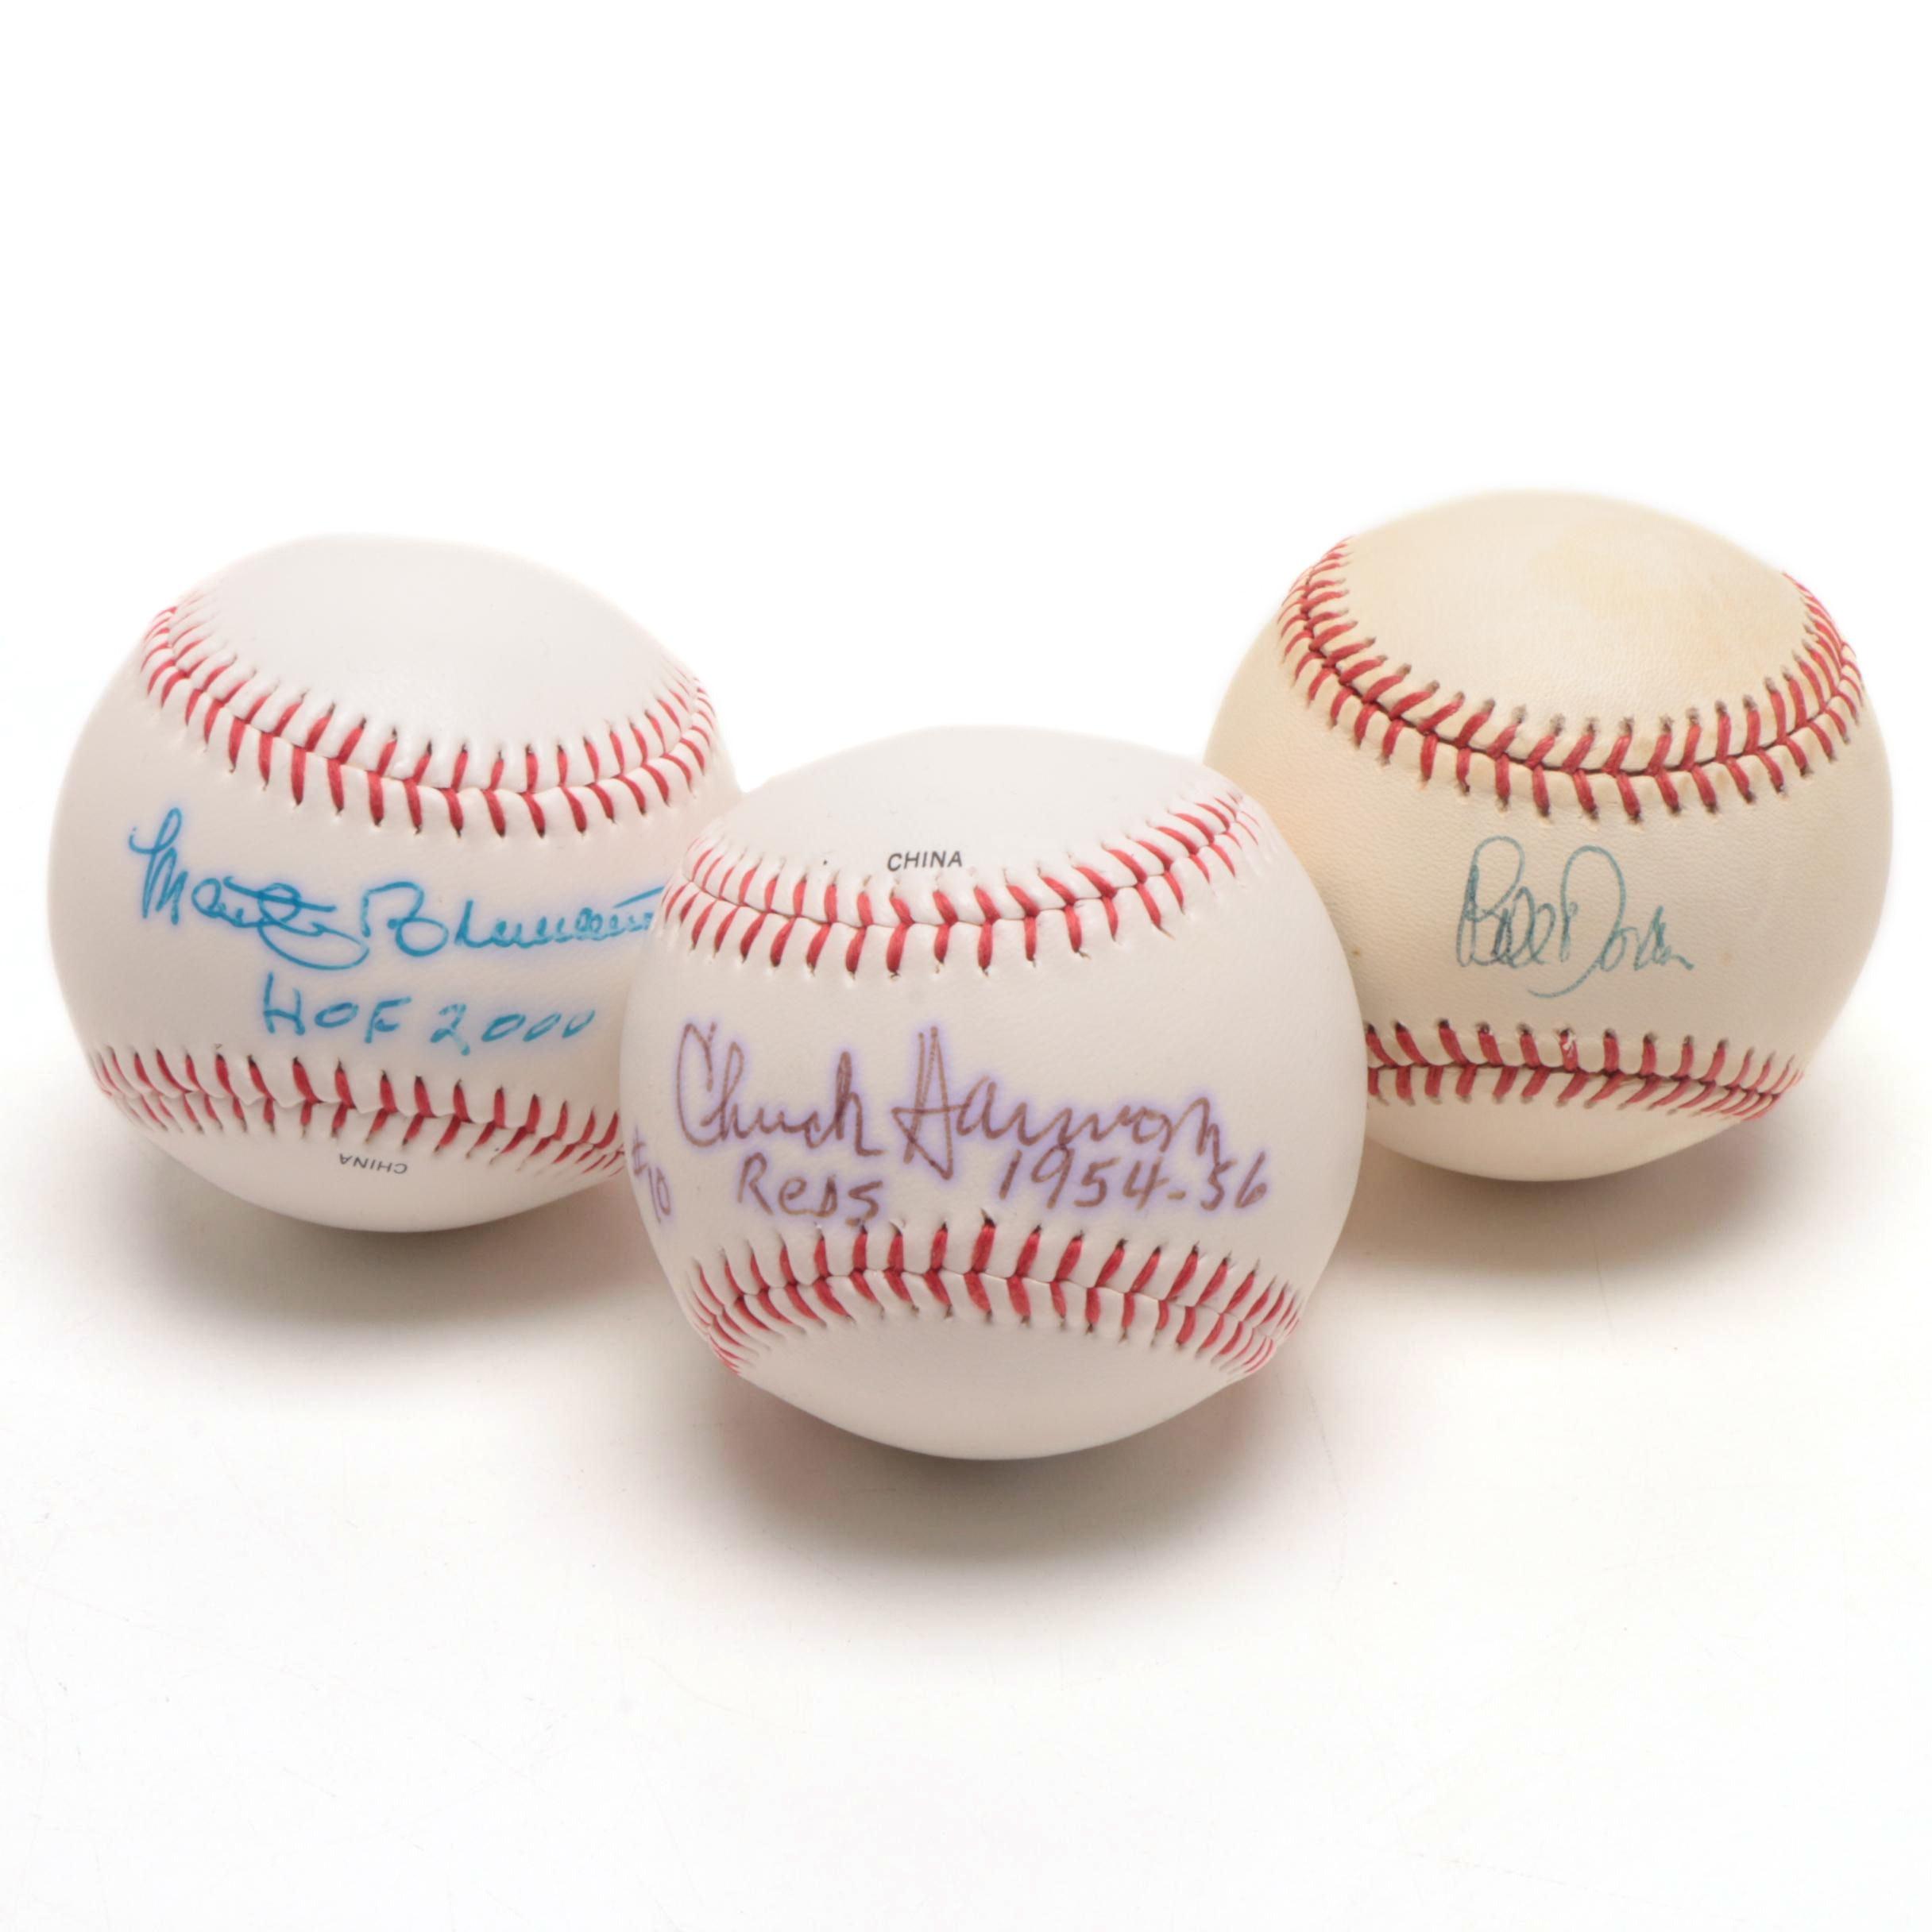 Marty Brennaman, Chuck Harmon, and Bill Doran Signed Baseballs